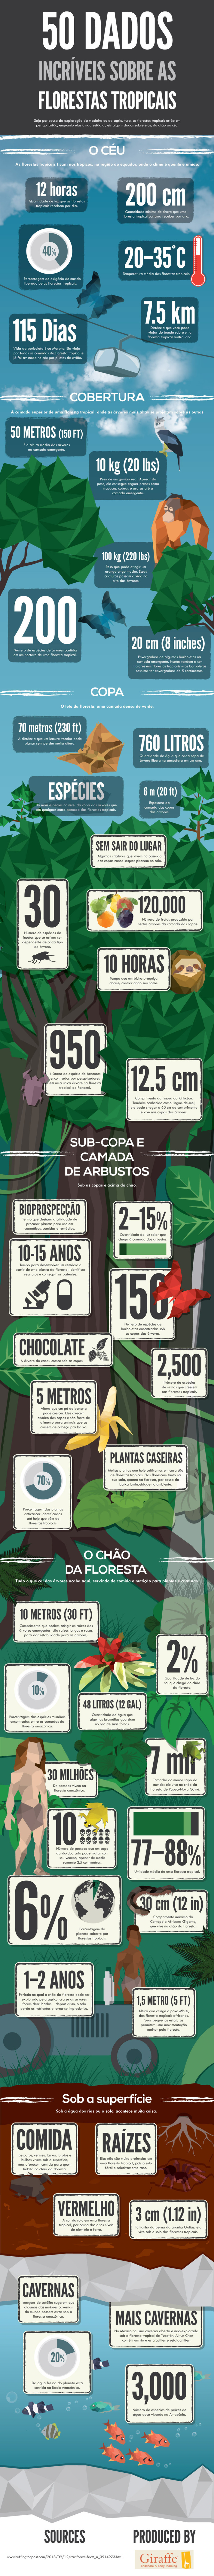 infográfico florestas